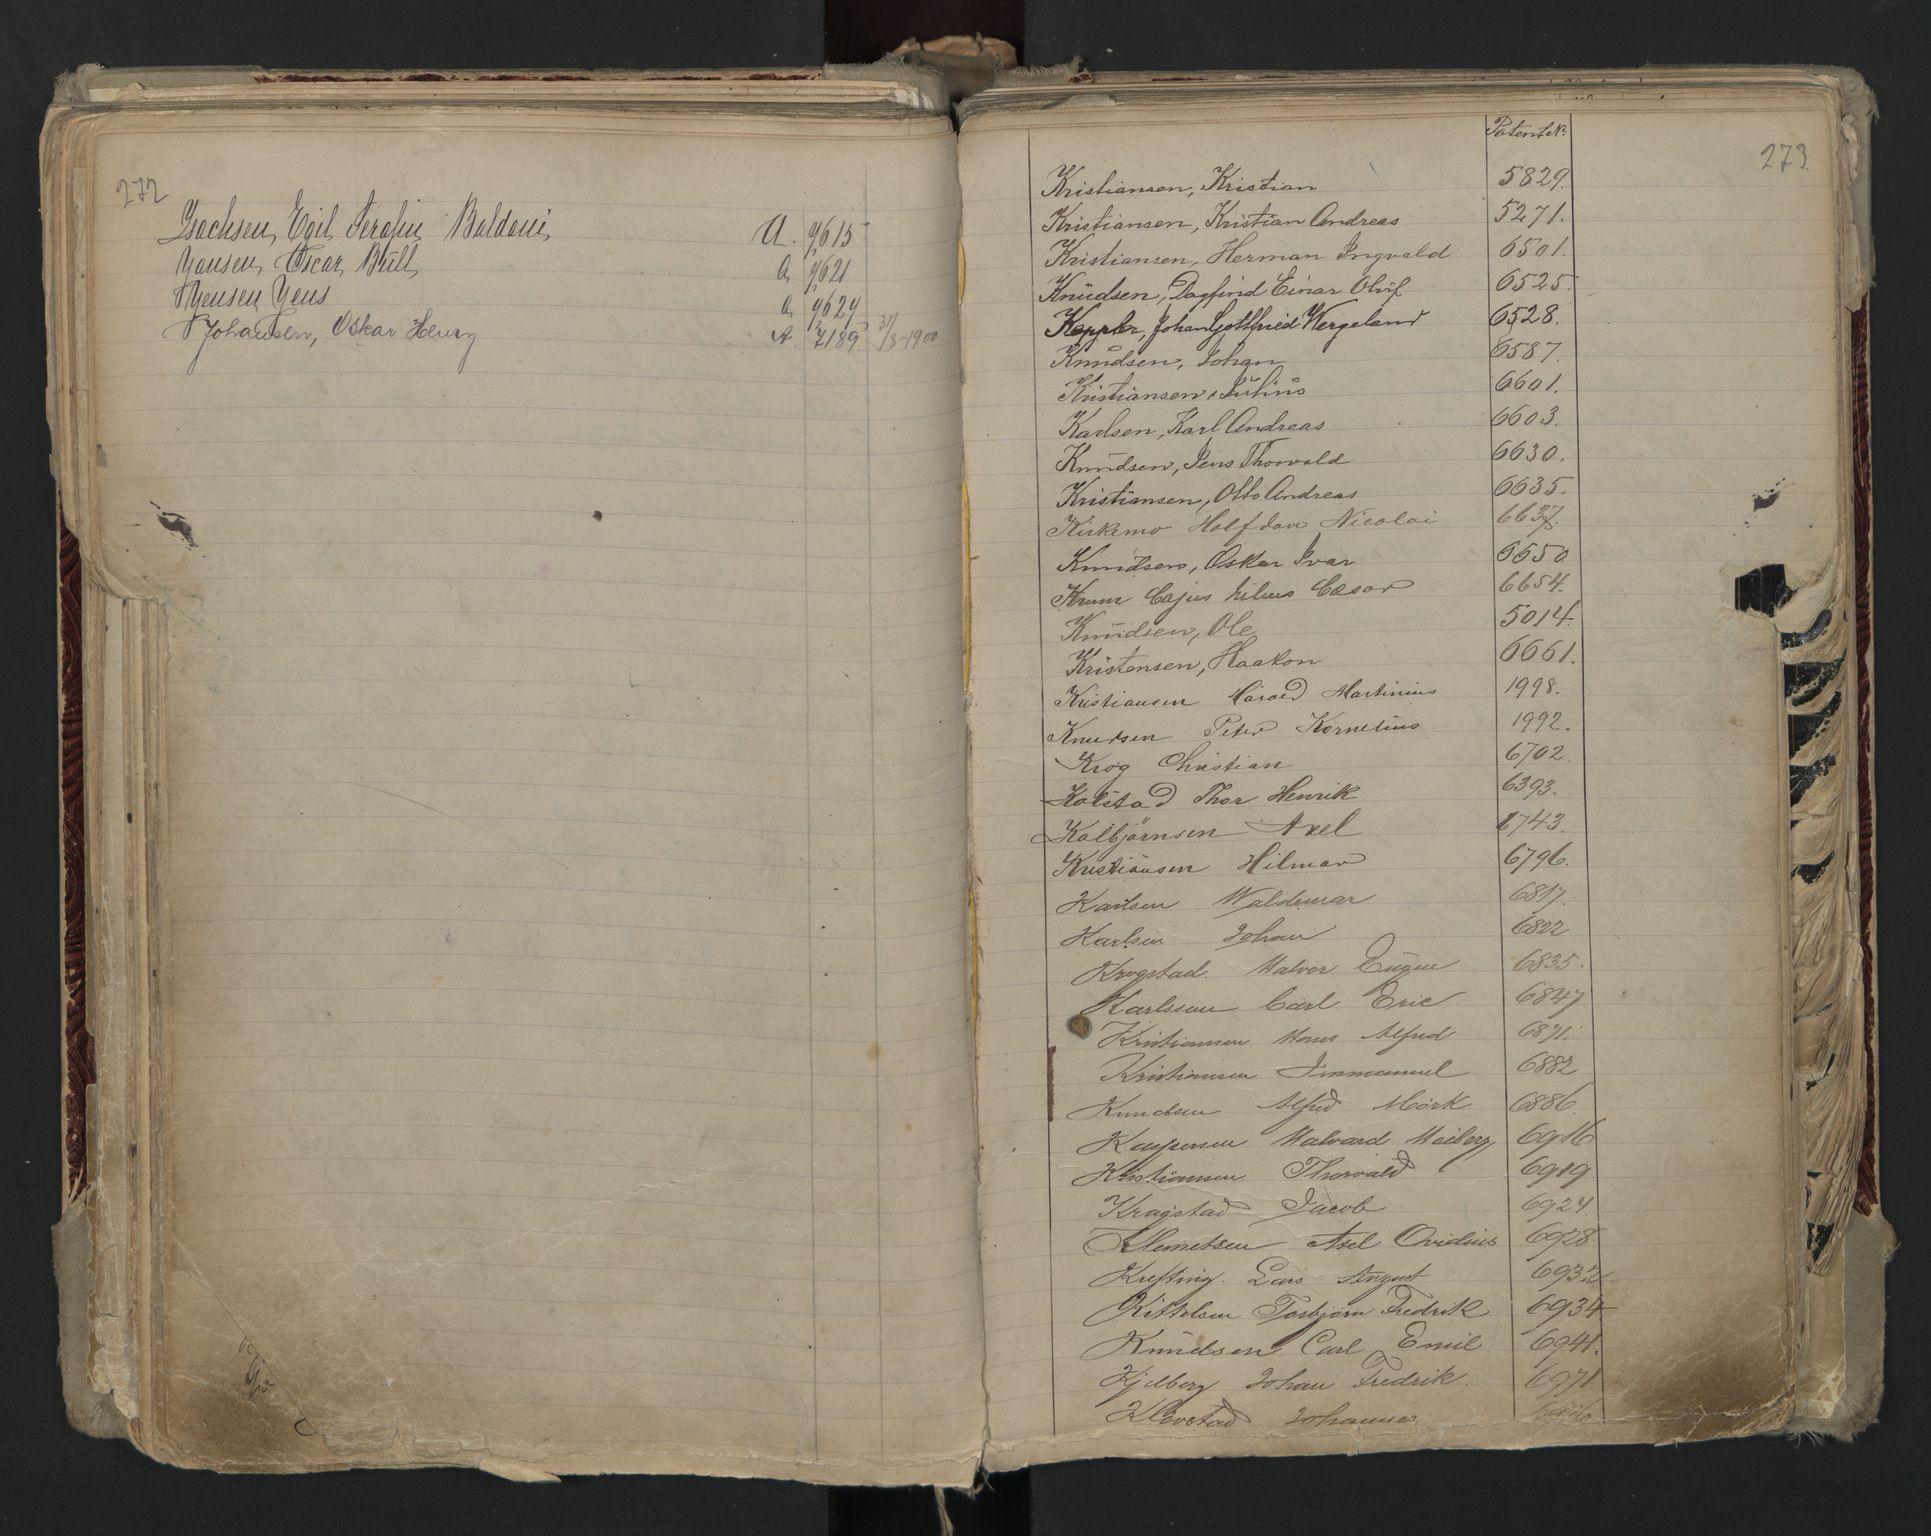 SAO, Oslo sjømannskontor, F/Fa/L0002: Register for Kristiania krets, 1866-1930, s. 272-273